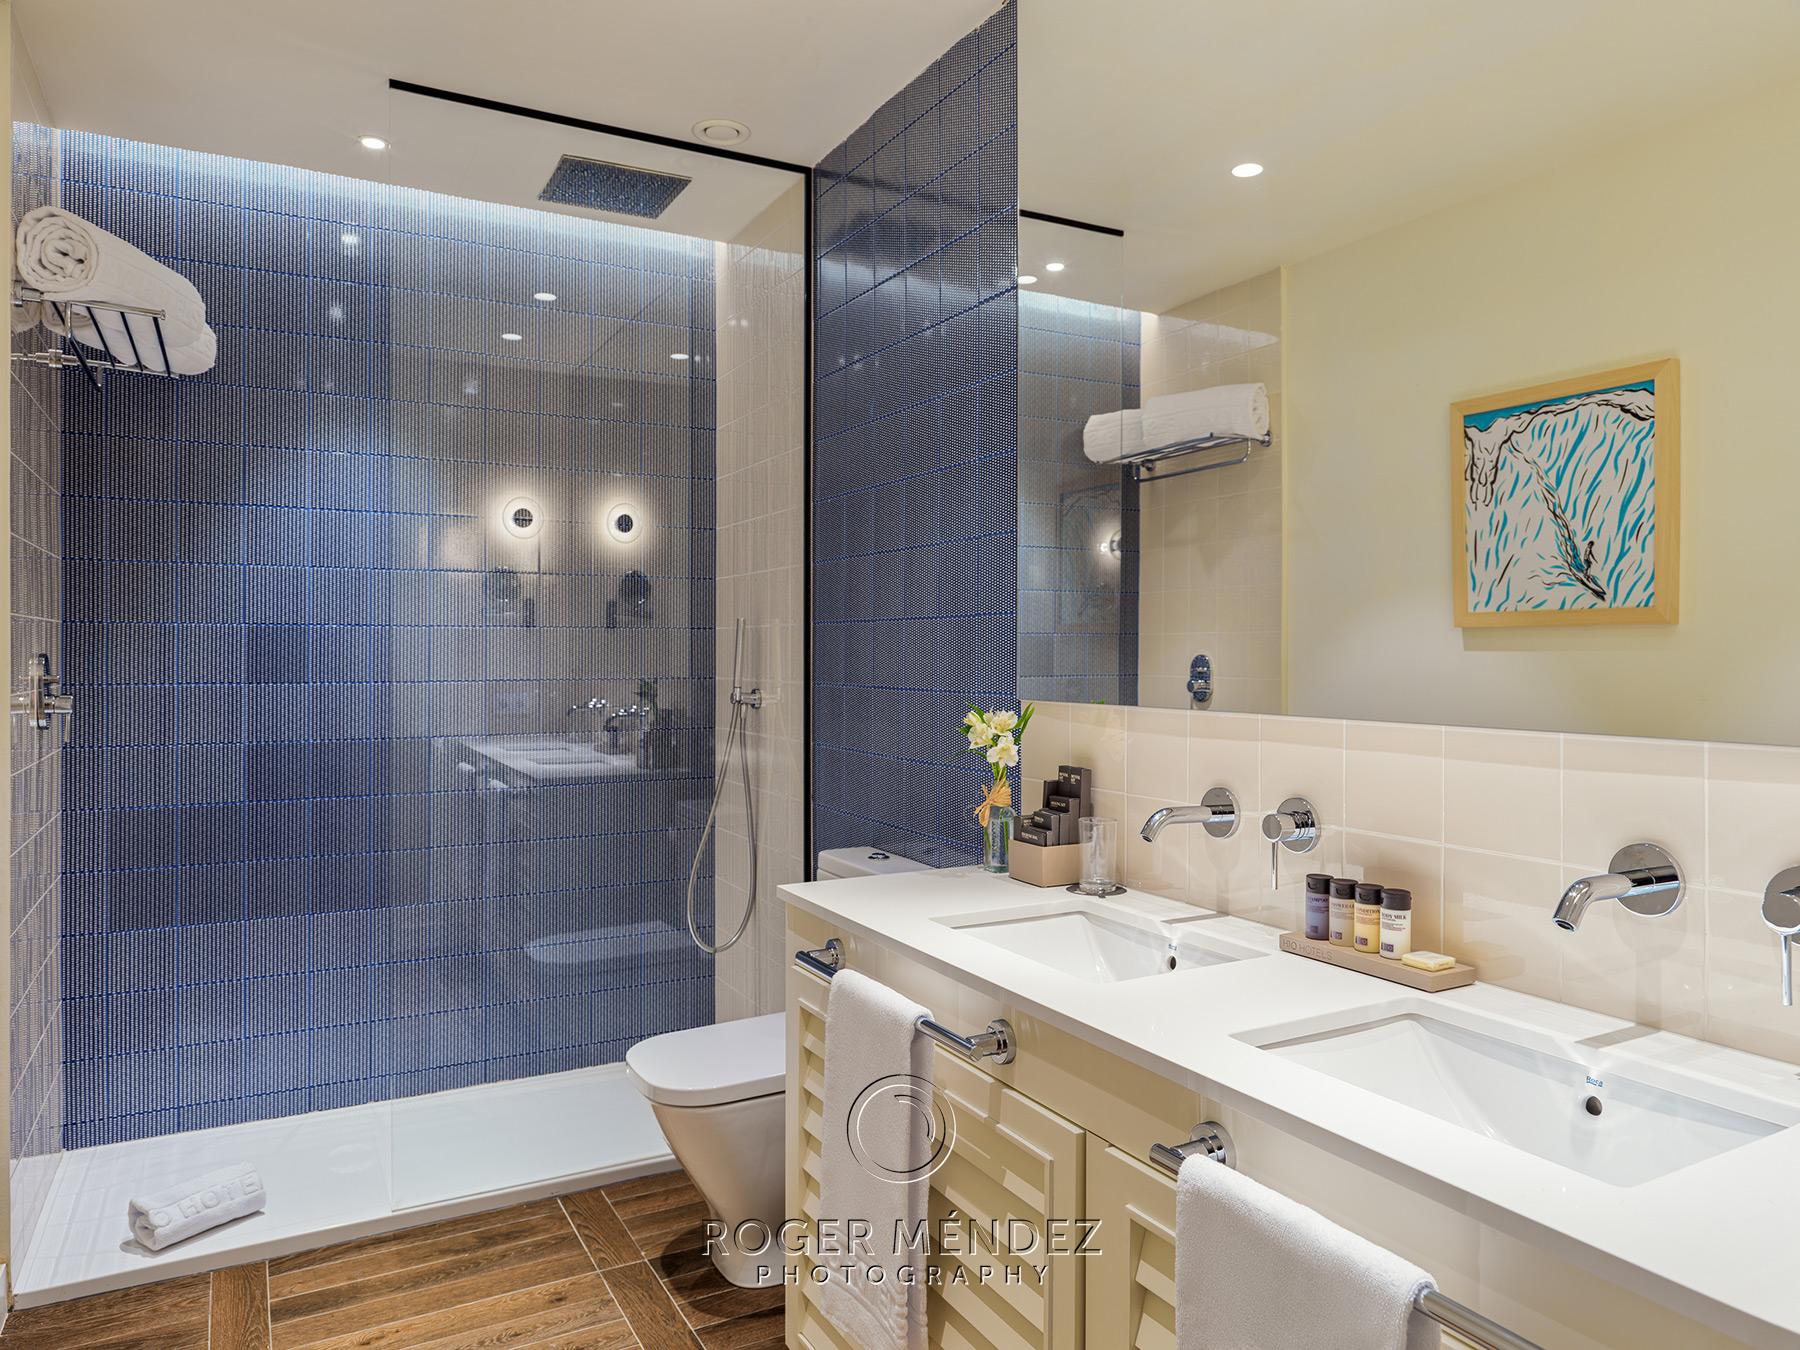 Baño suite imperial H10 Imperial Tarraco